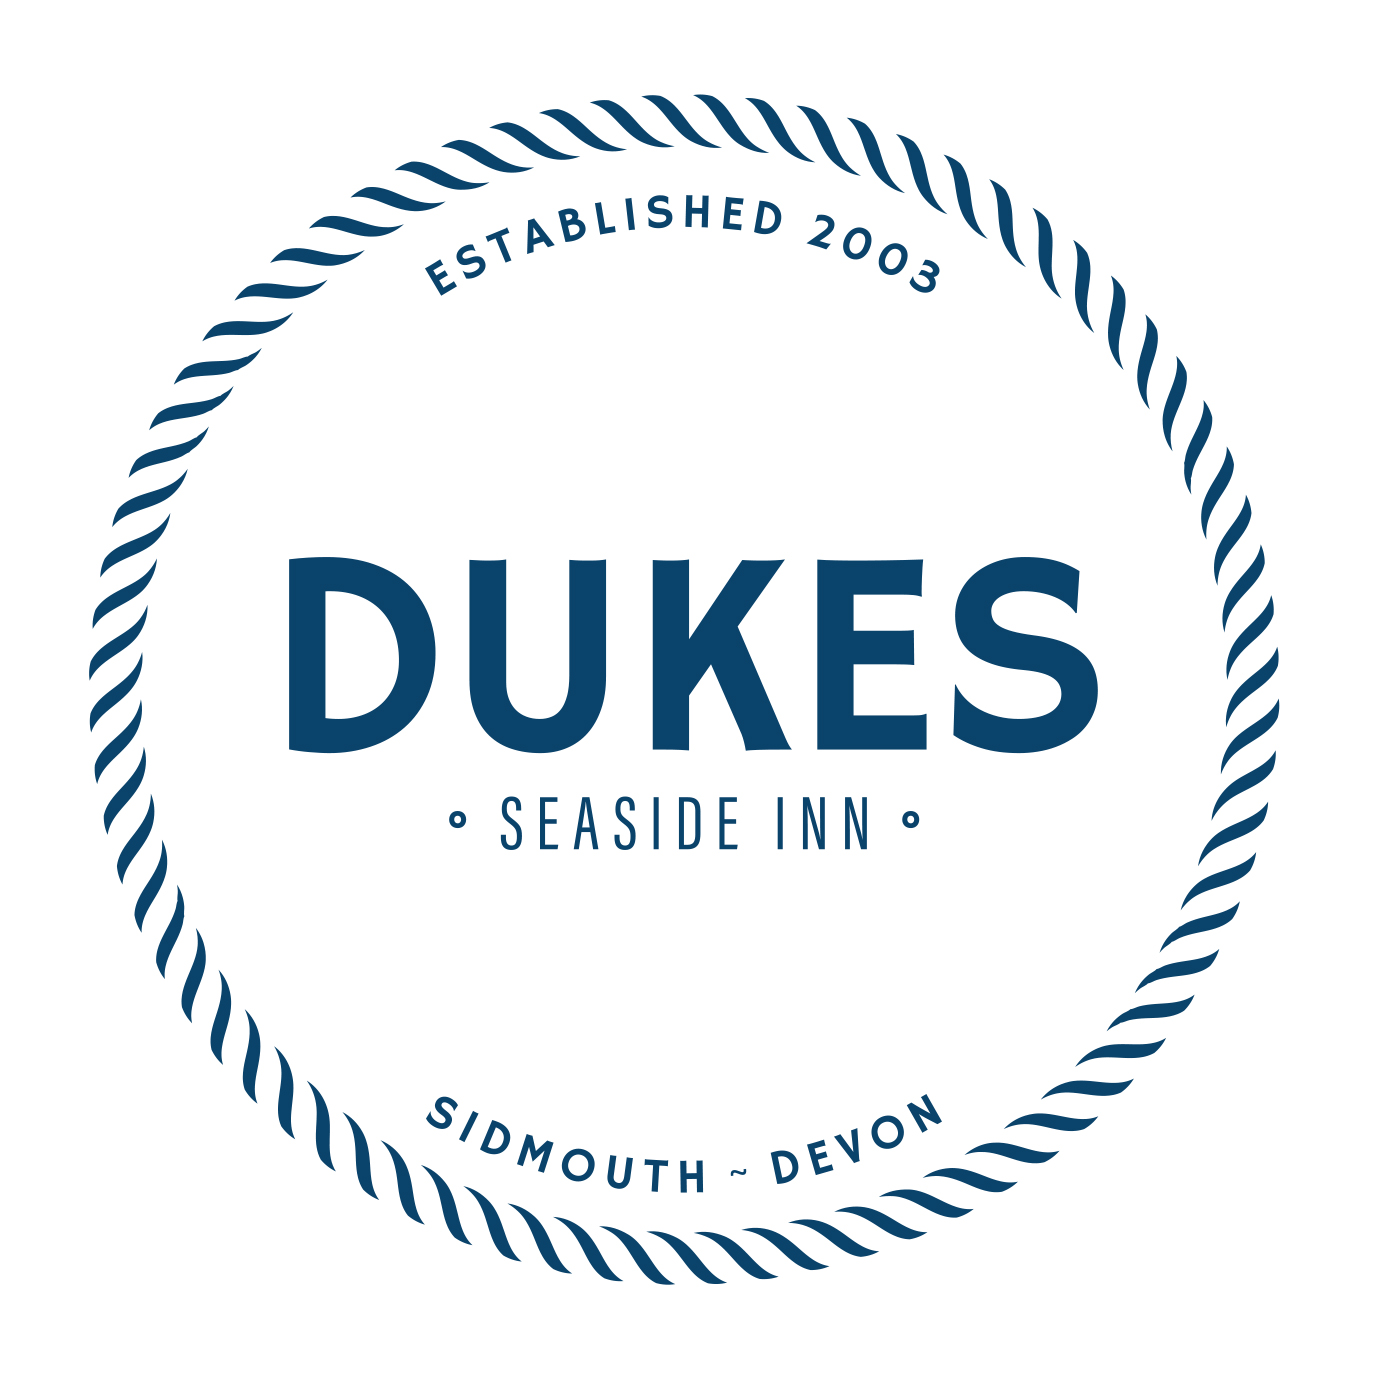 Dukes Rebrand